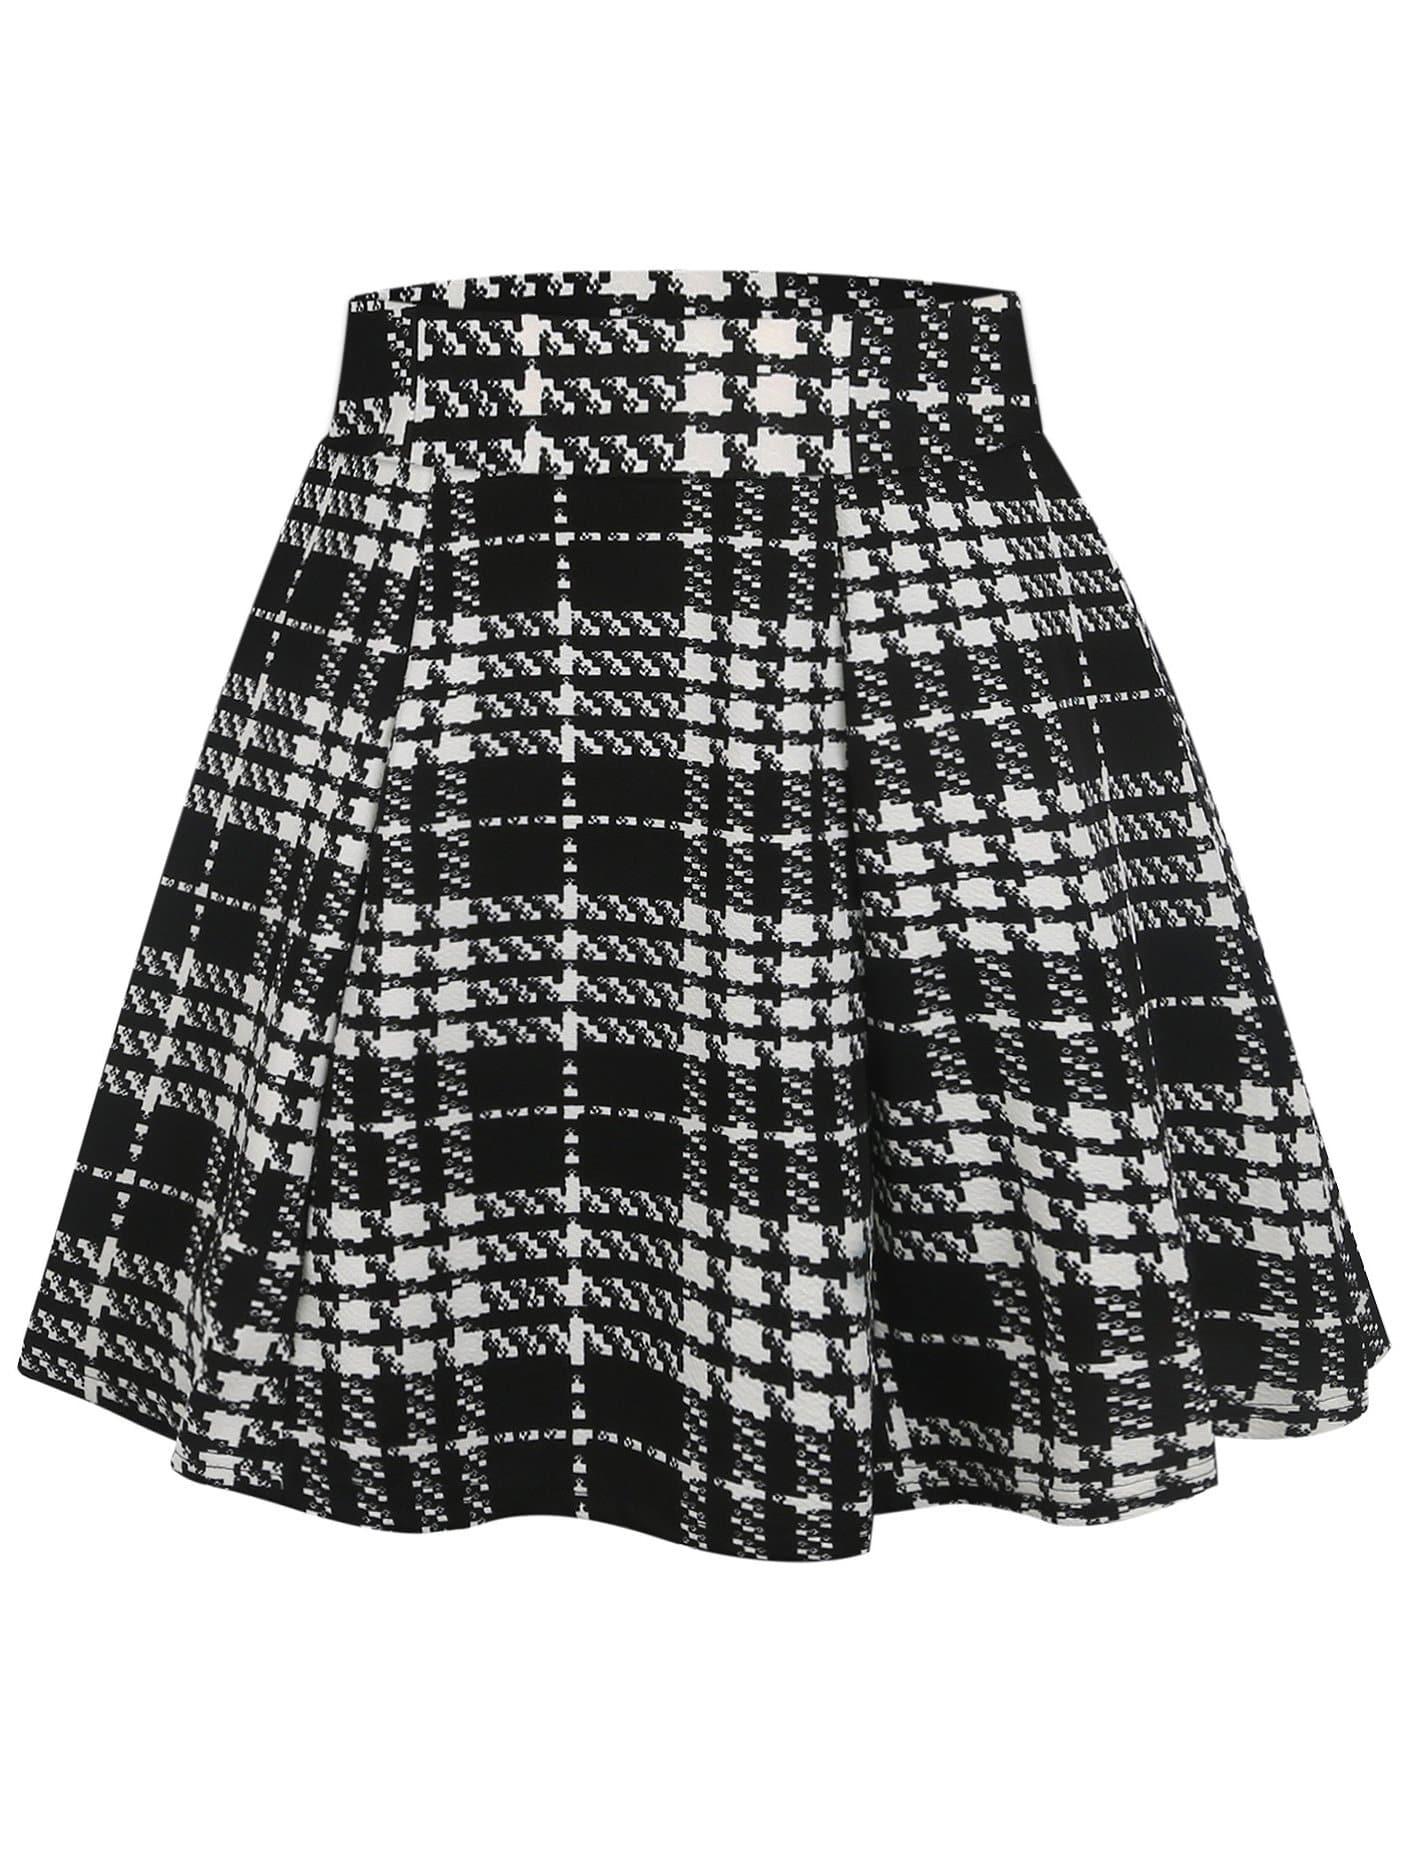 50s юбка в клетку thumbnail